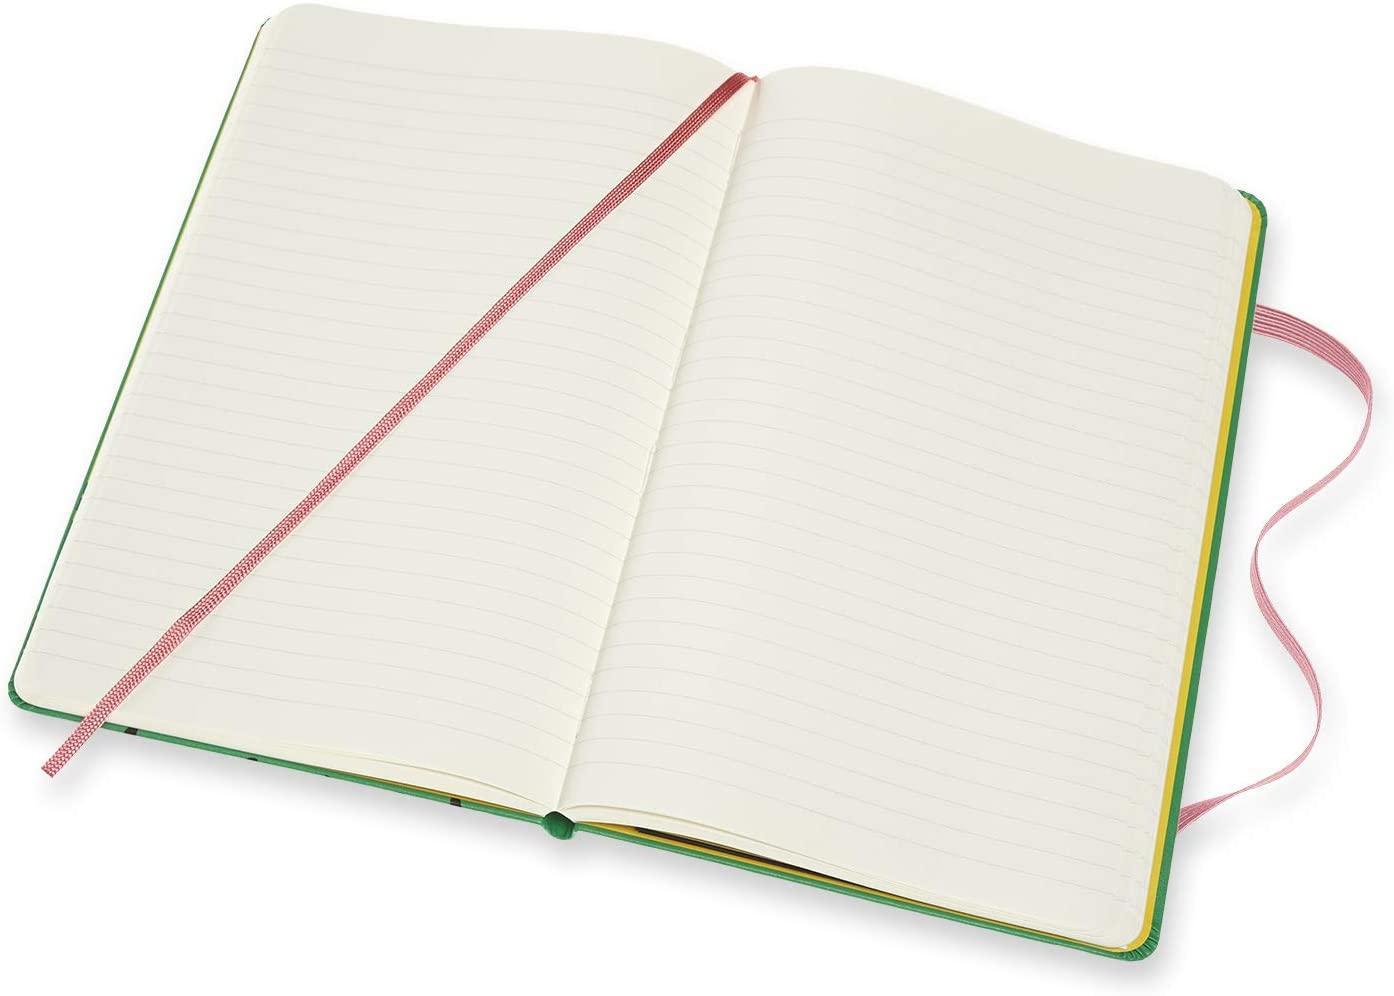 Notes FRIDA KAHLO - zeleni